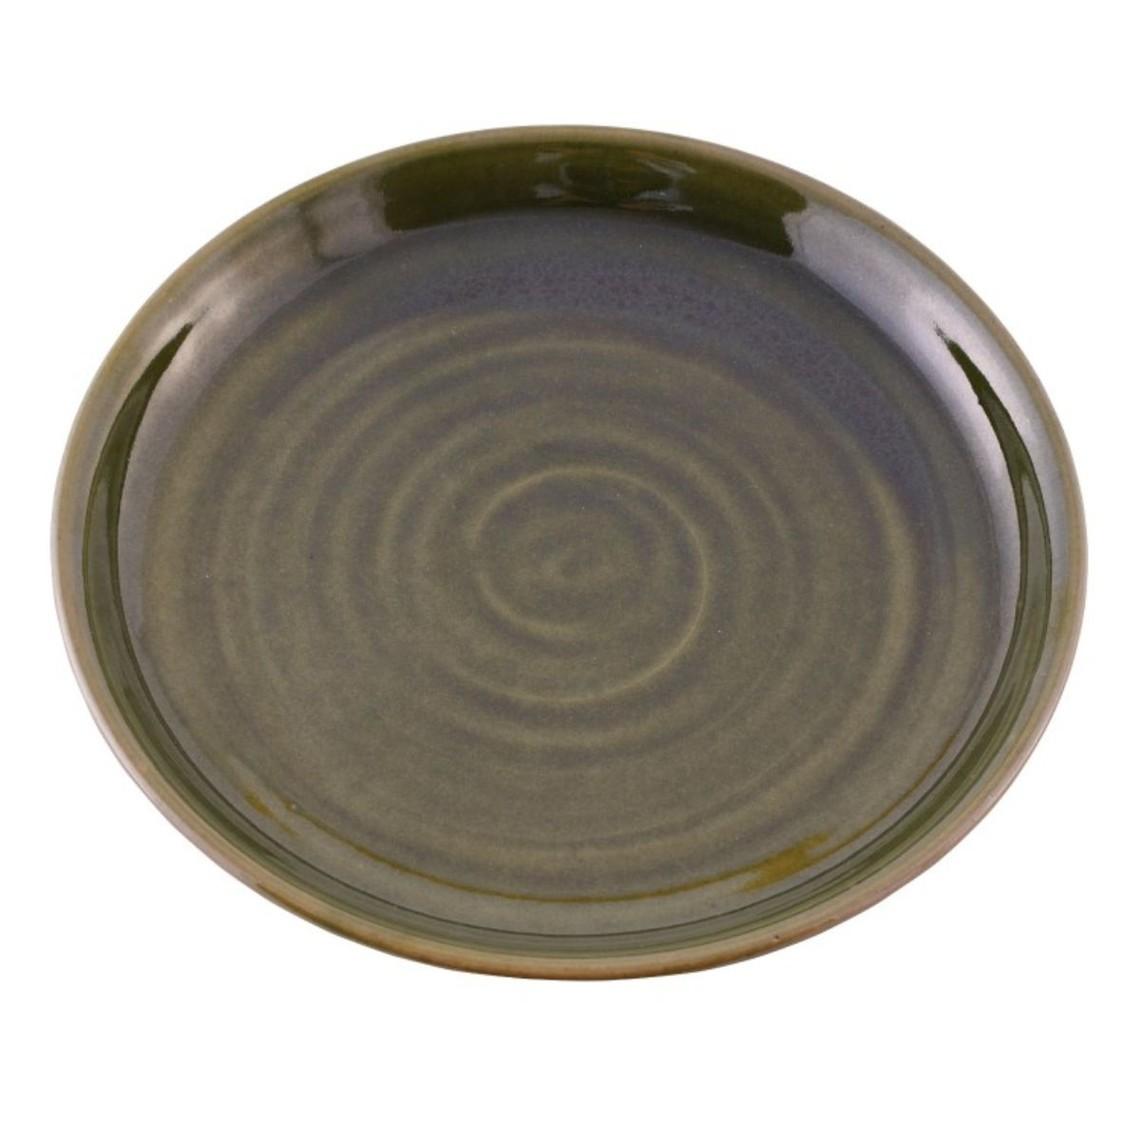 15th century plate, green